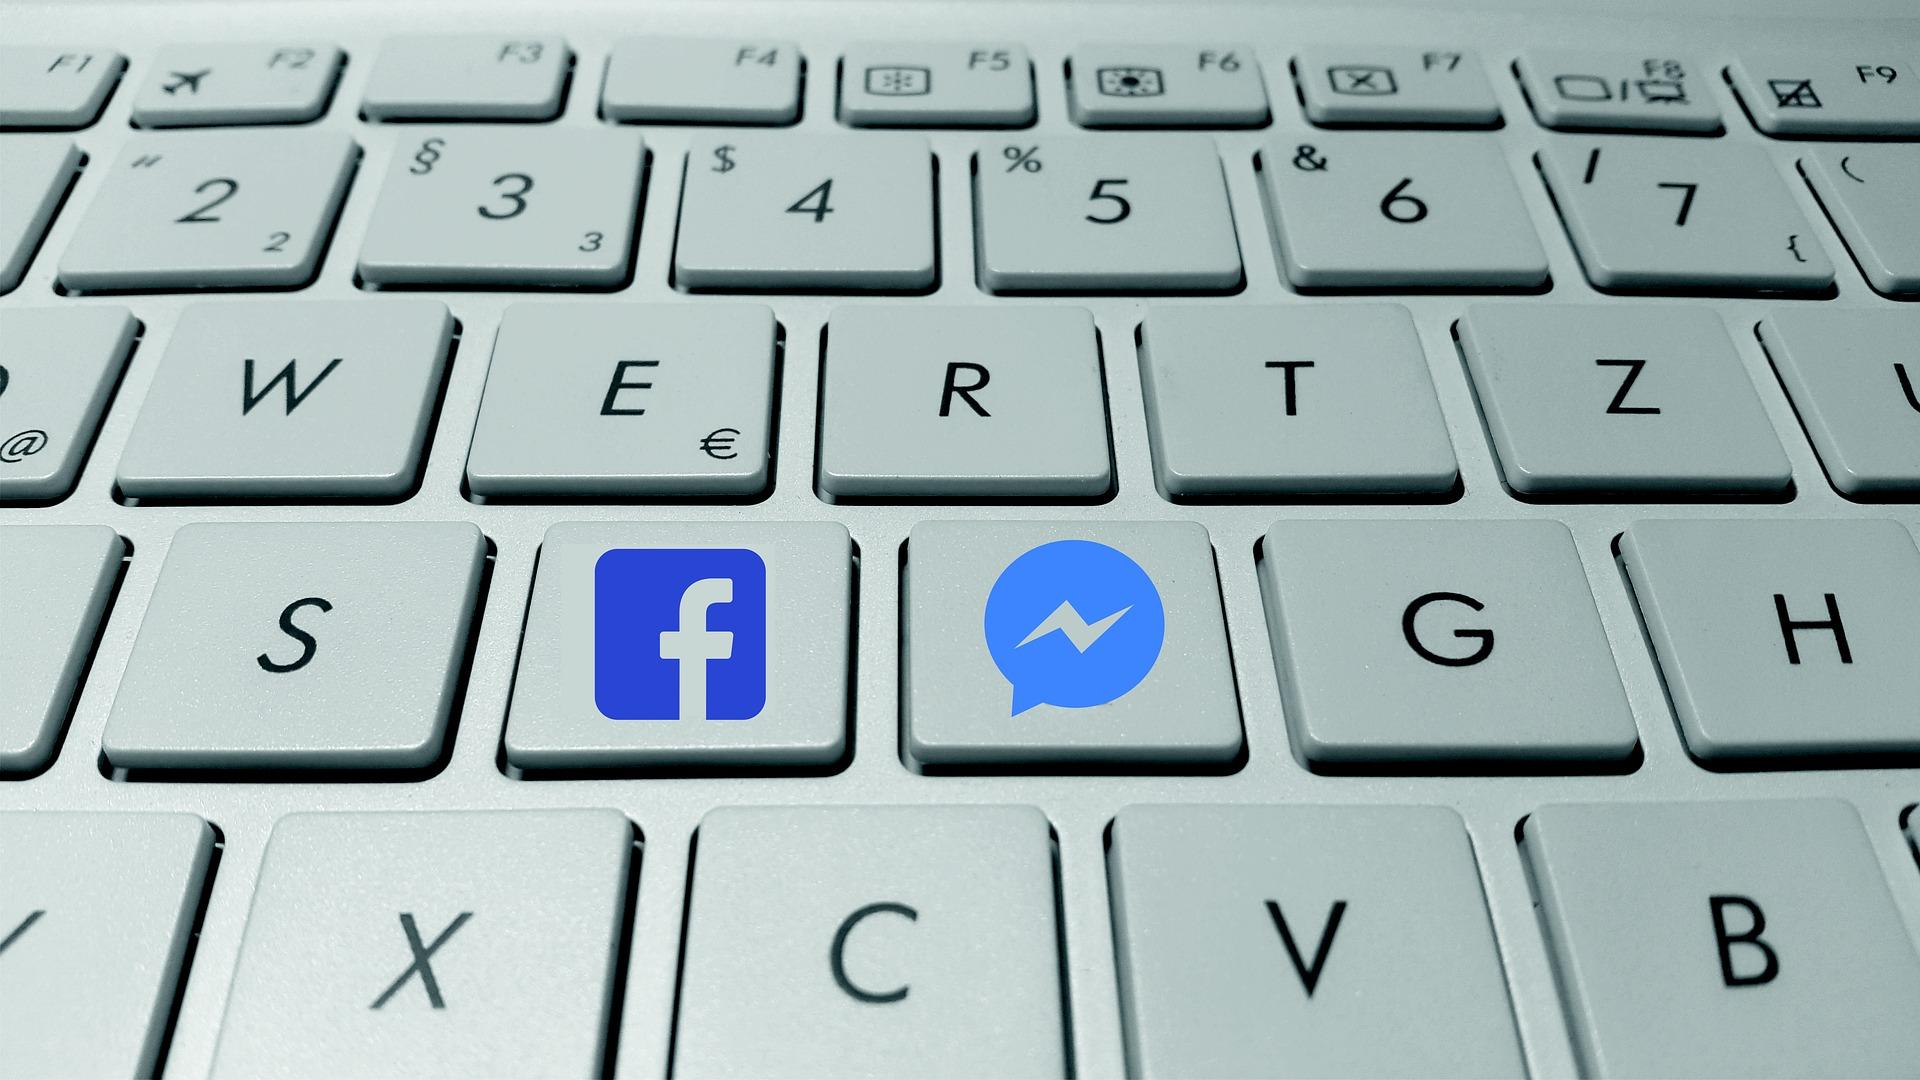 keyboard-1804326_1920